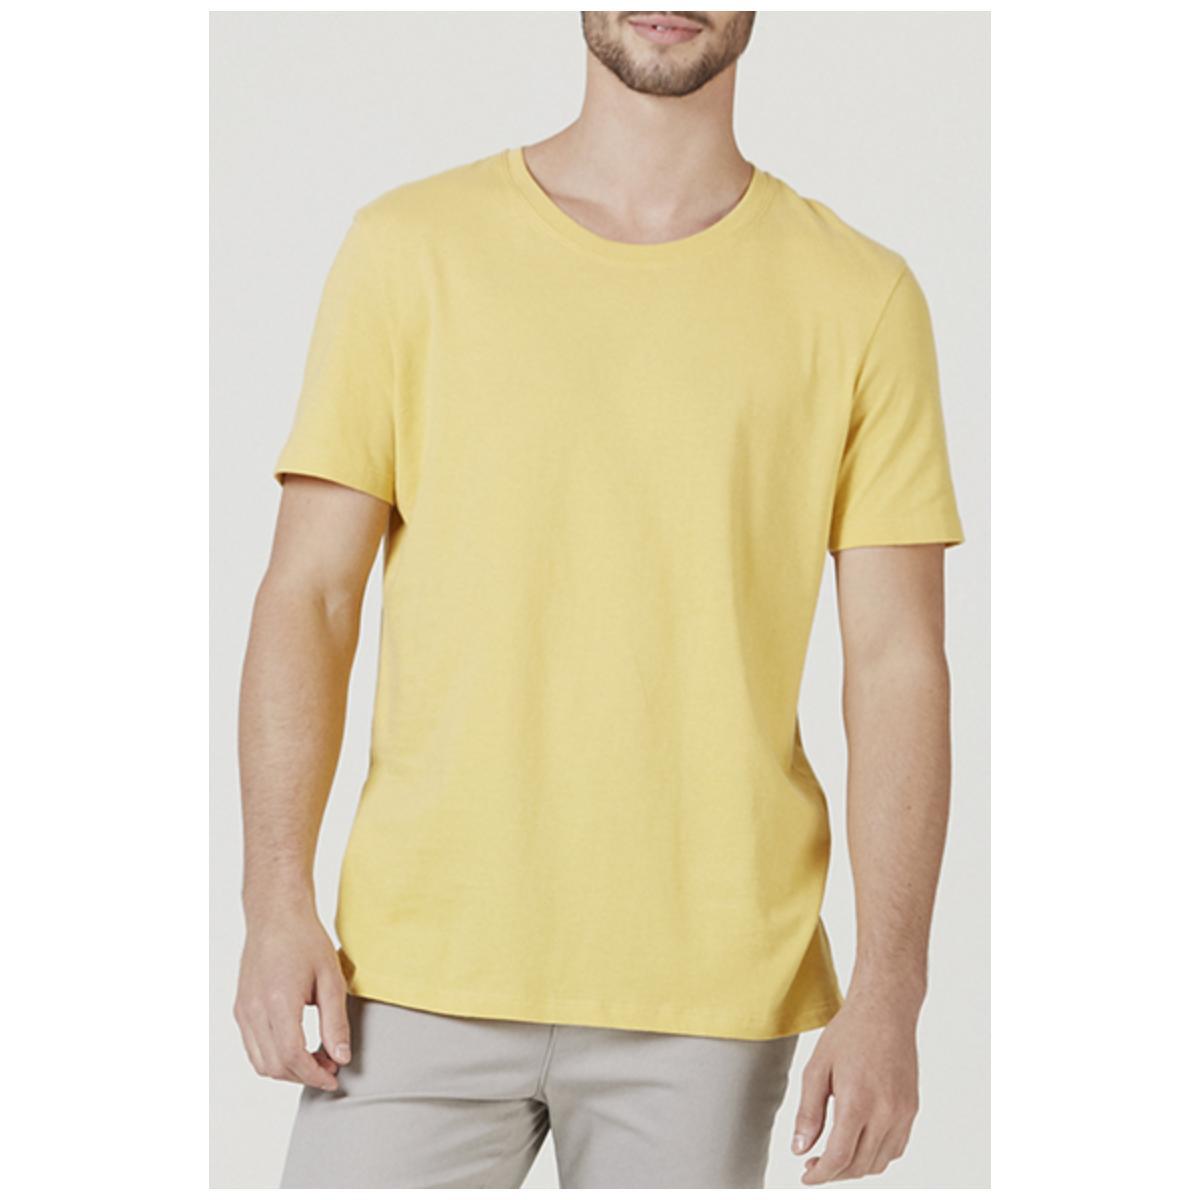 Camiseta Masculina Hering 0201 Ynjen Amarelo